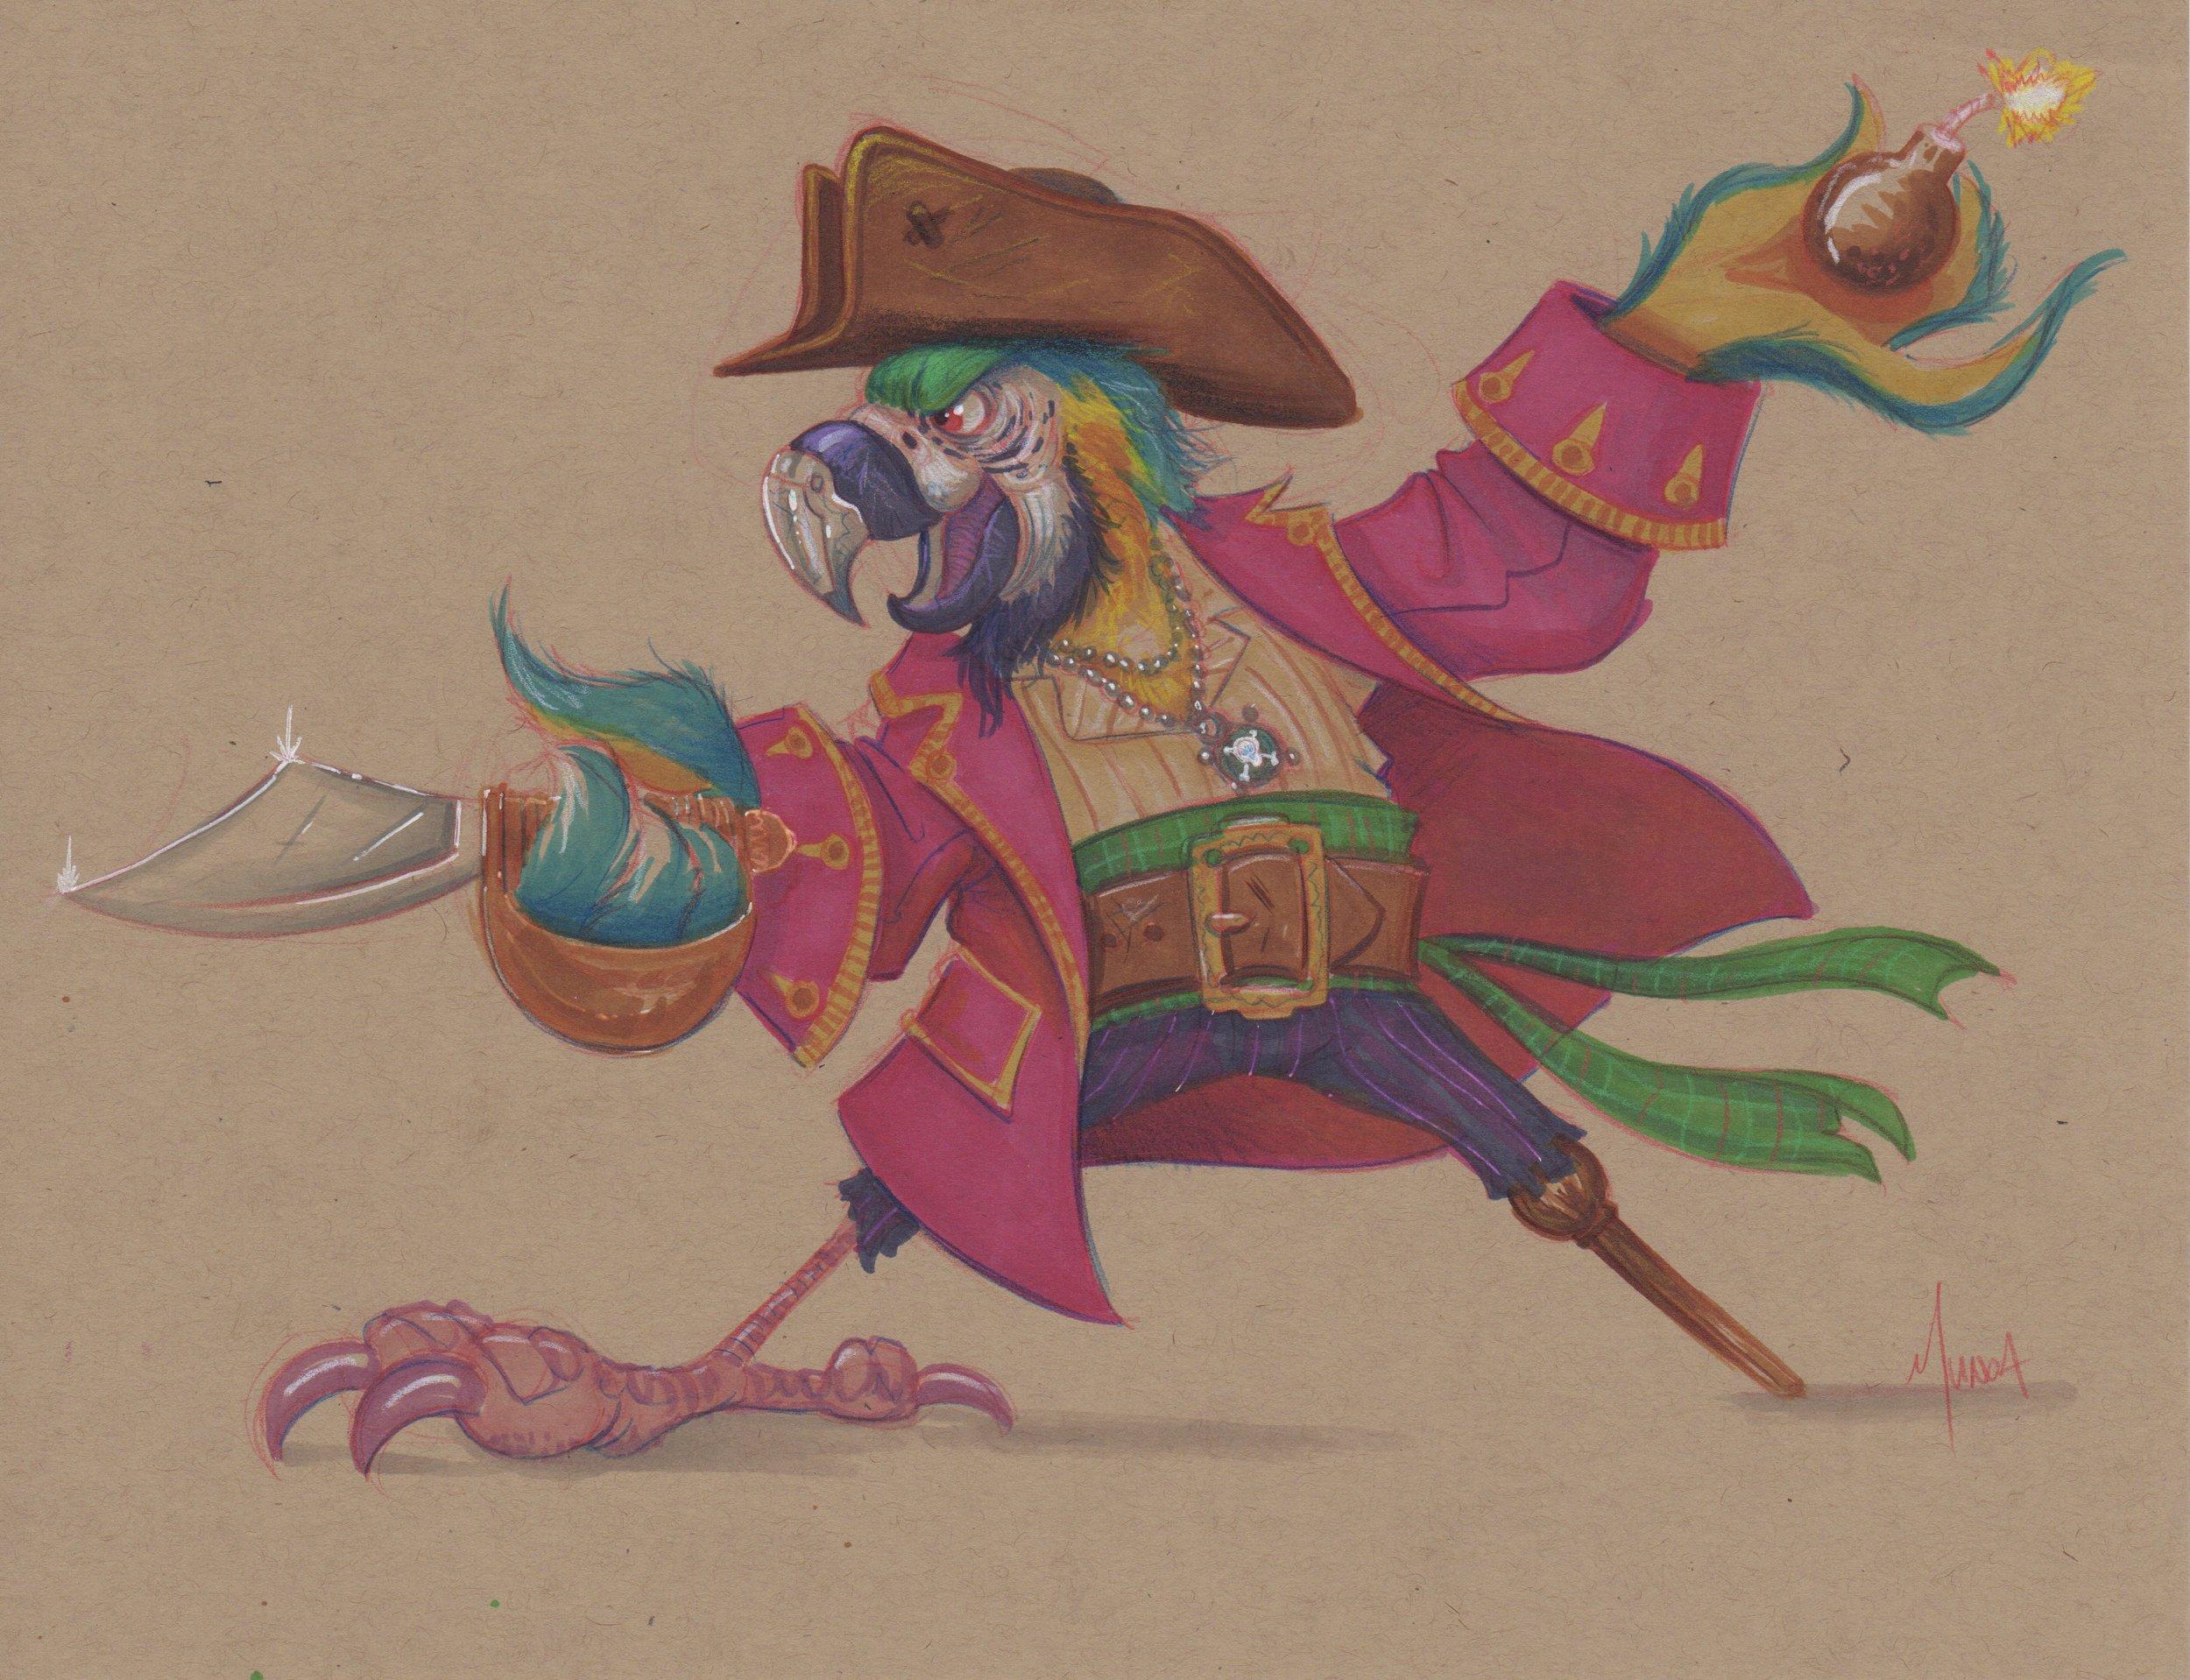 macaw-pirate_sketch.jpeg